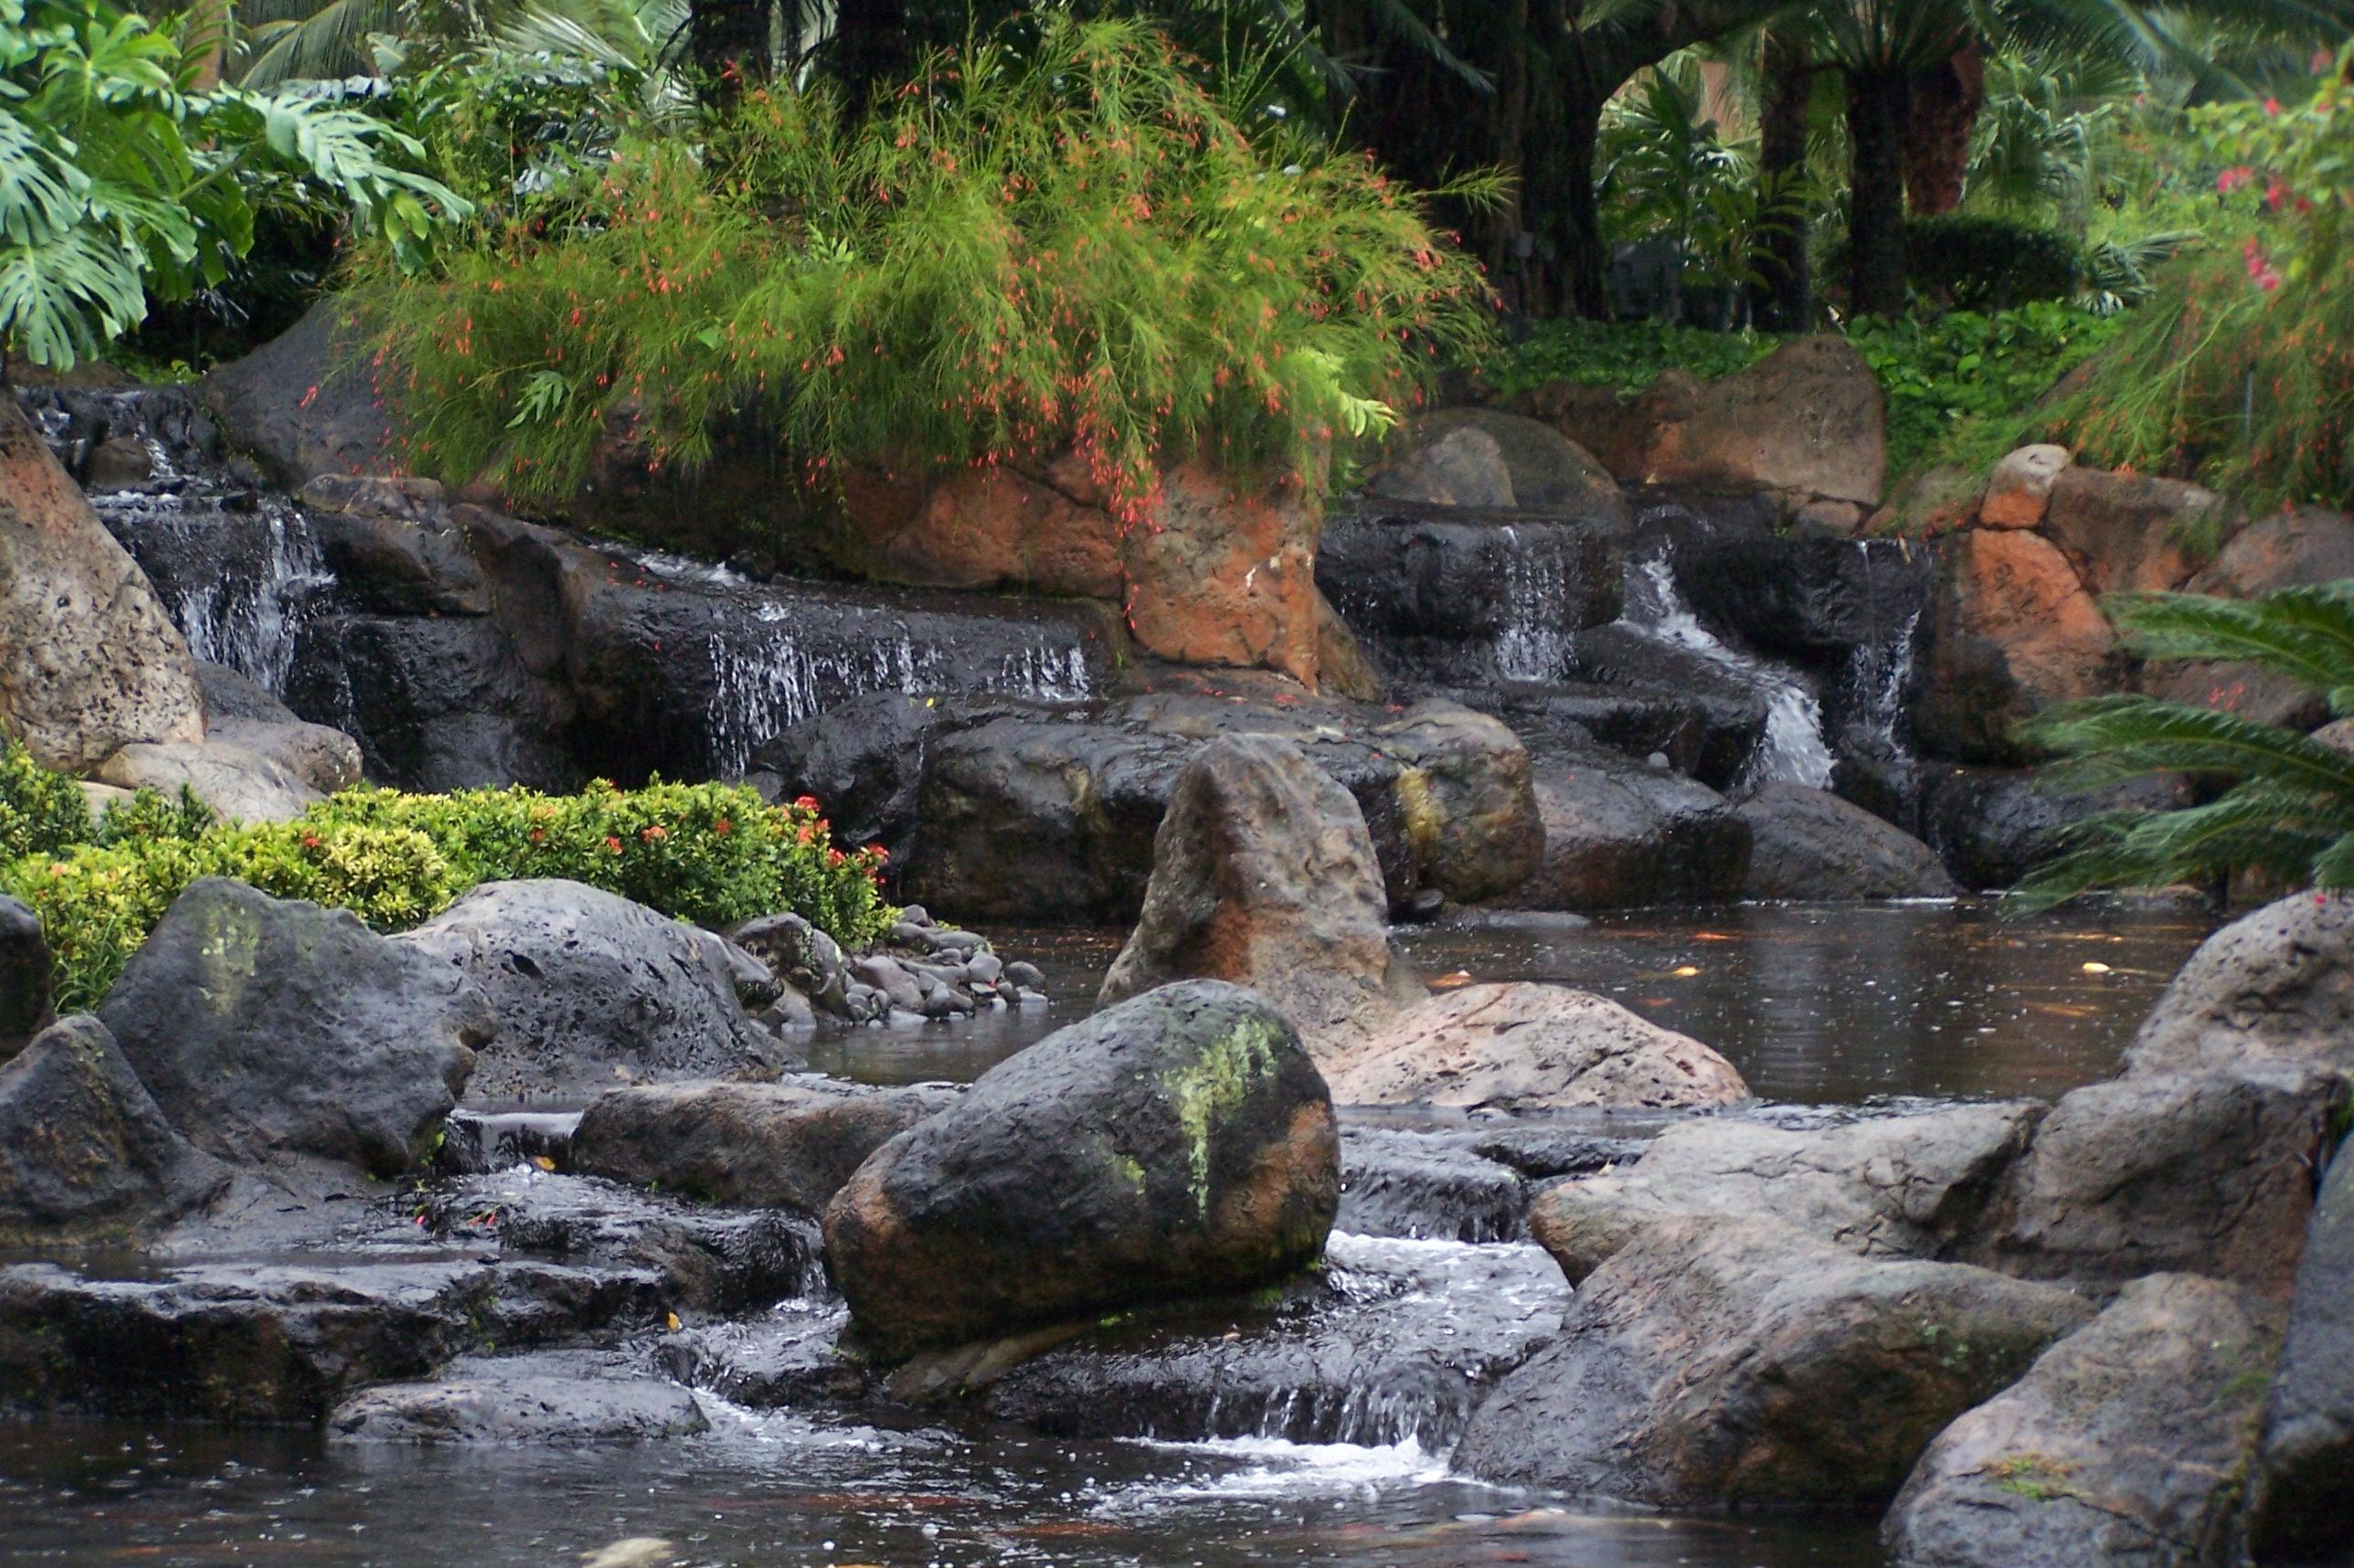 Tropical Water Garden, Flowers, Garden, Plants, Rock, HQ Photo